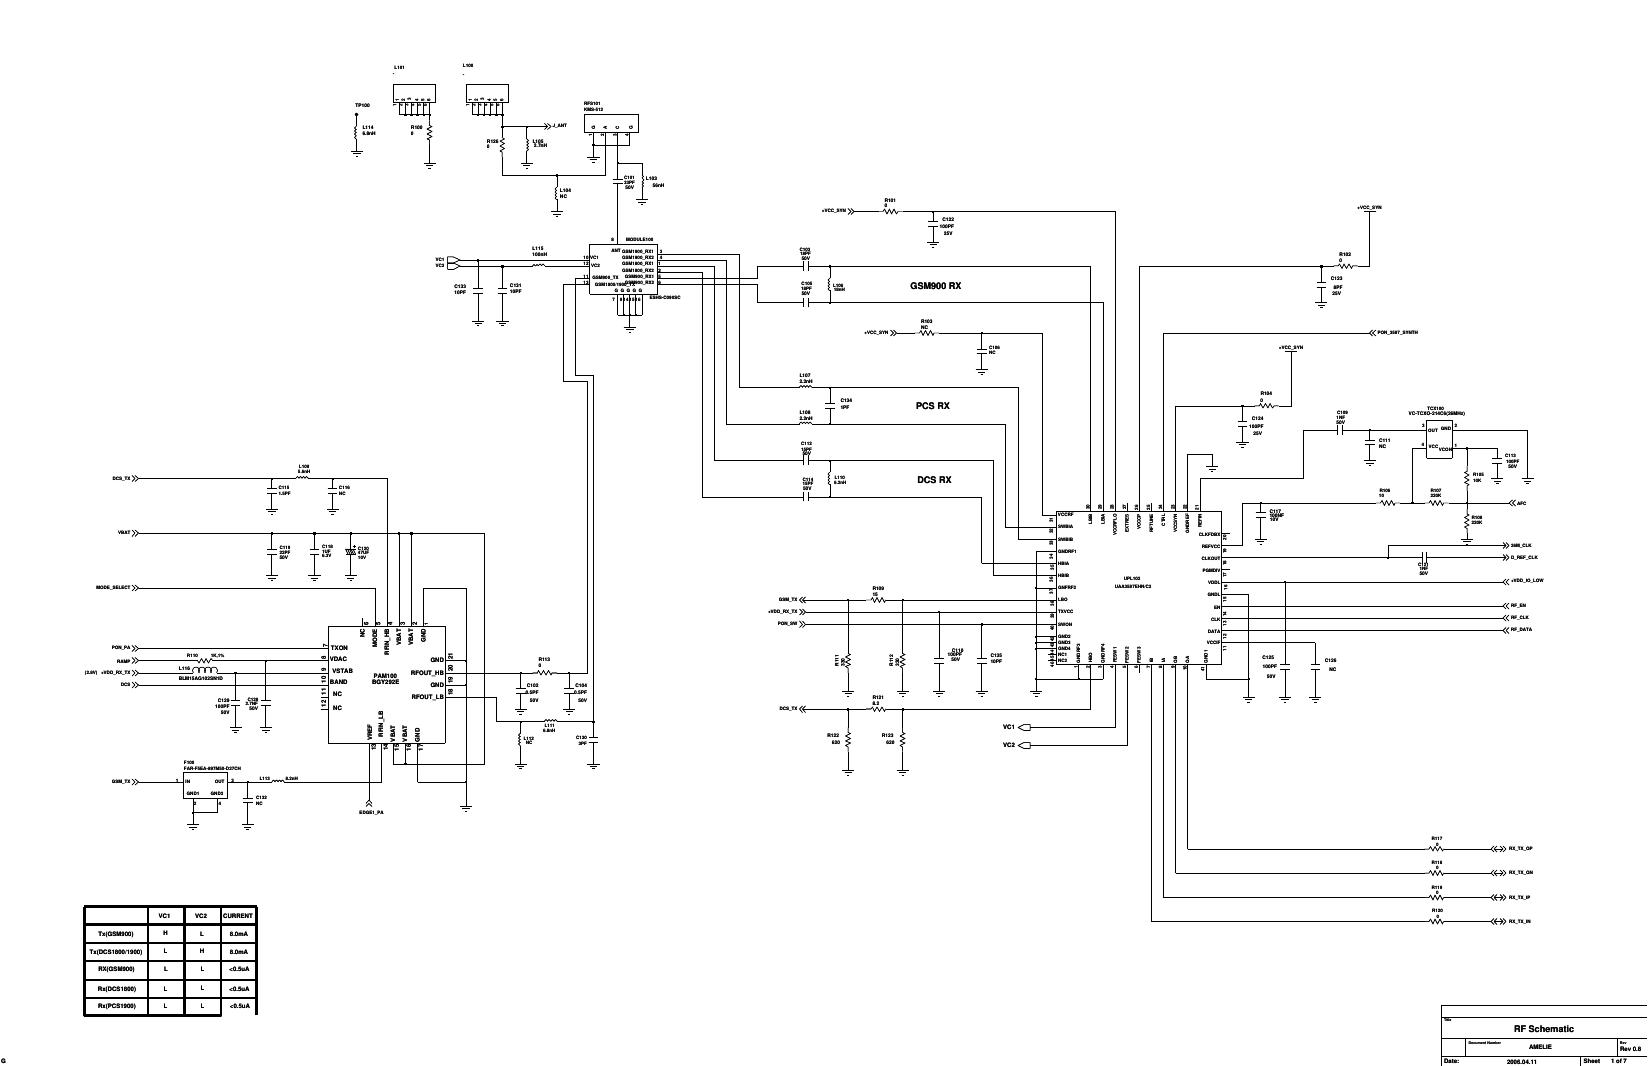 Samsung Sgh E500 Schematicsl S Manualscom Schematics R08 N620 Service Manual